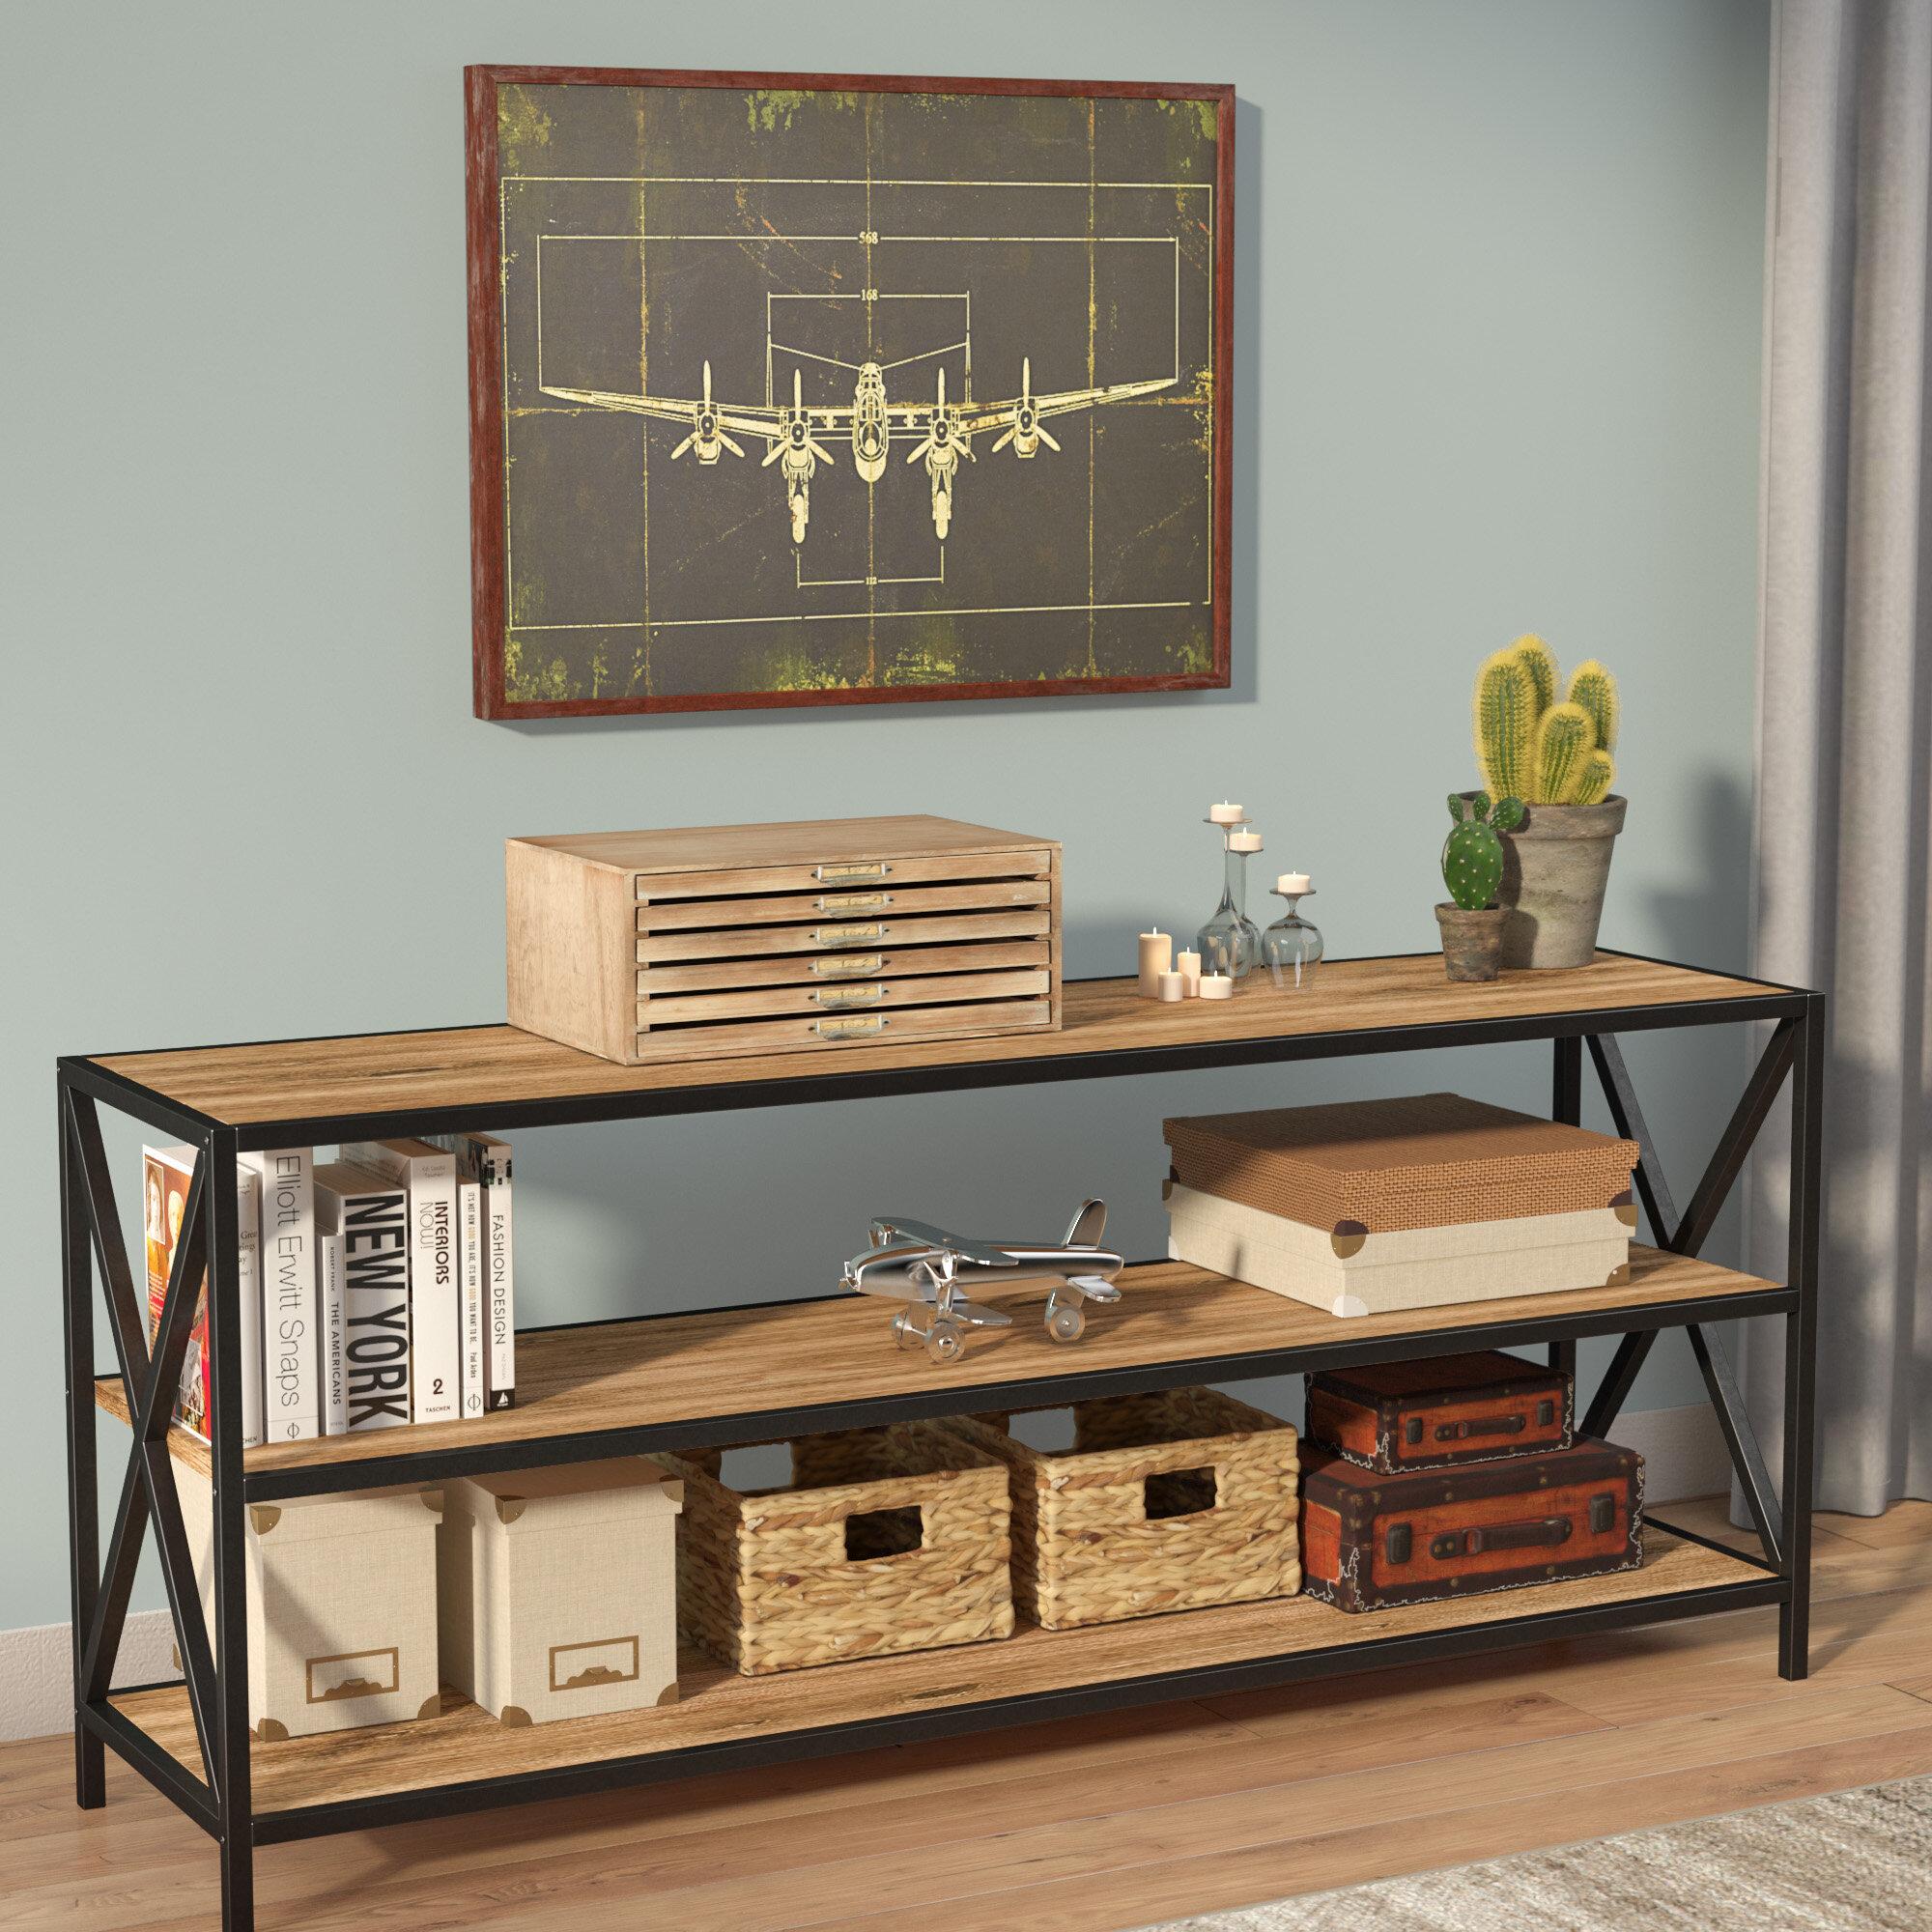 Trent Austin Design Augustus Media Etagere Bookcase U0026 Reviews | Wayfair